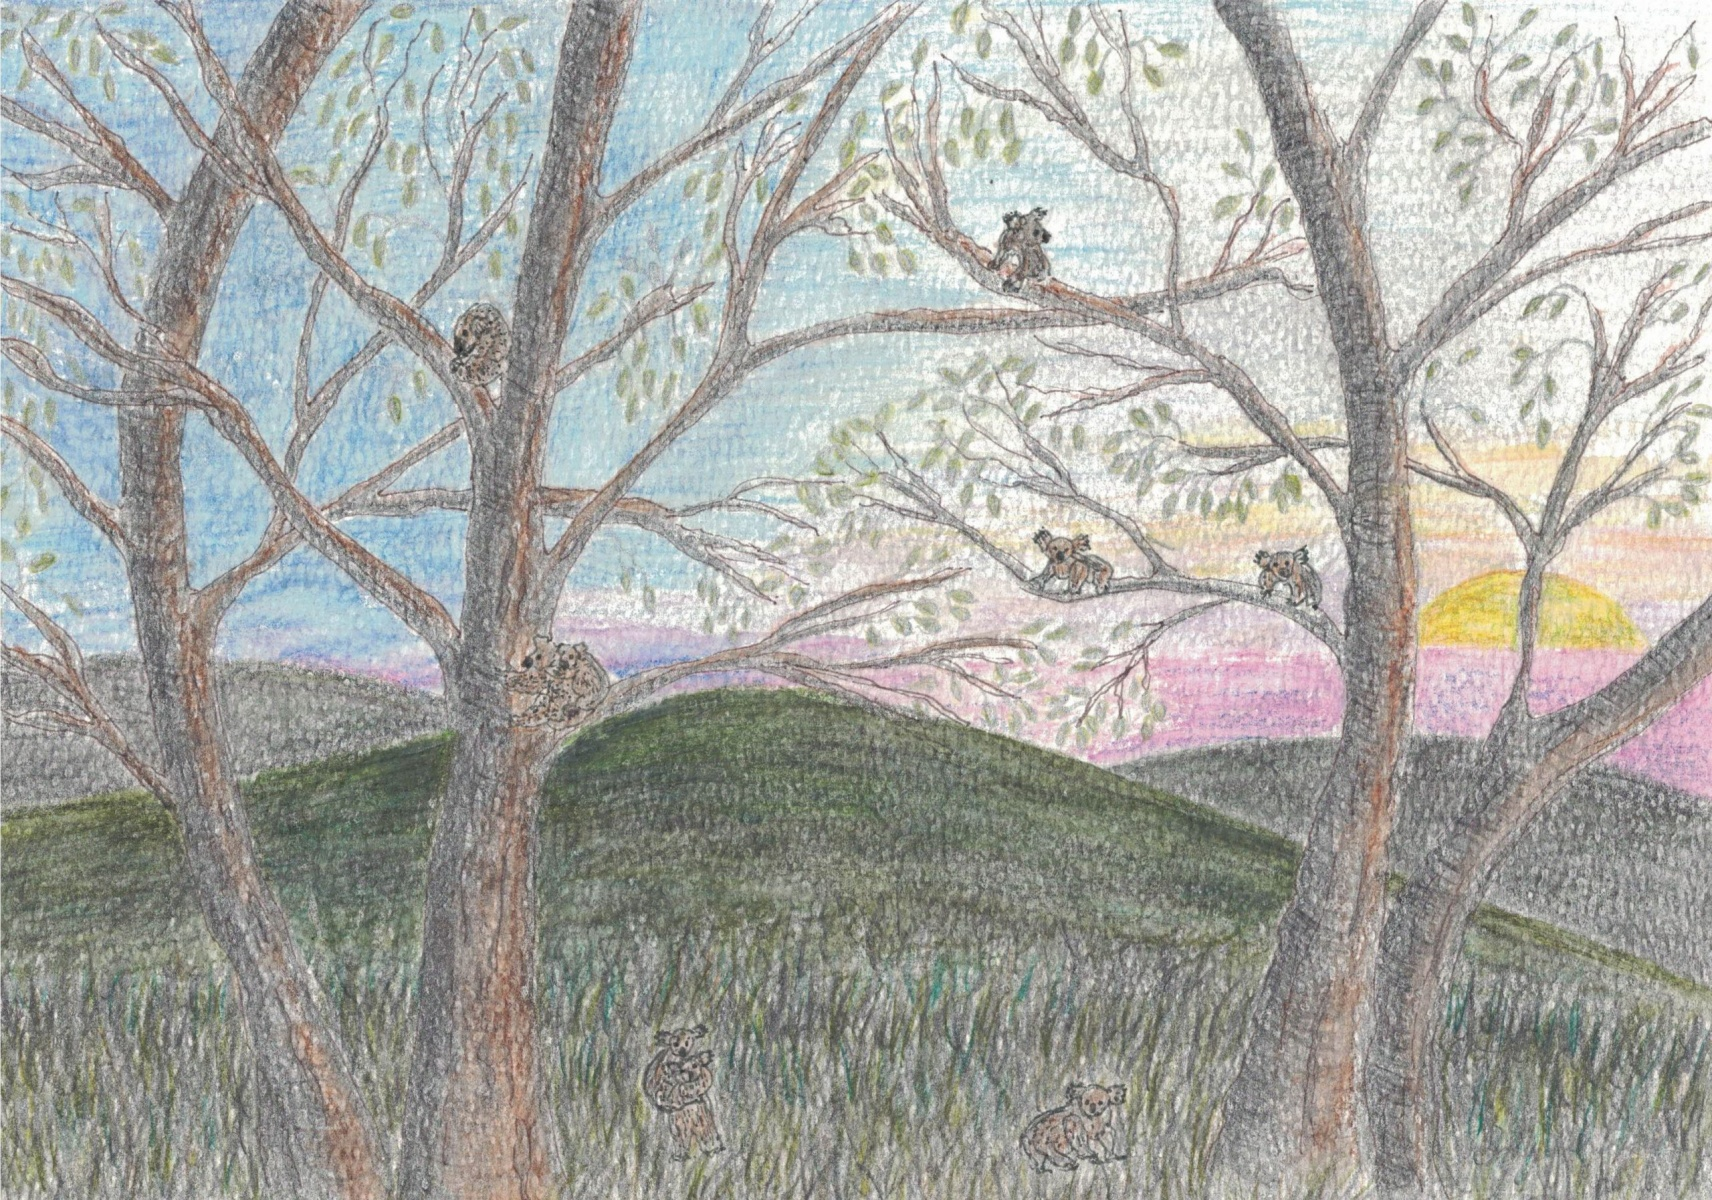 Koala Country - Sally Ann Glenn